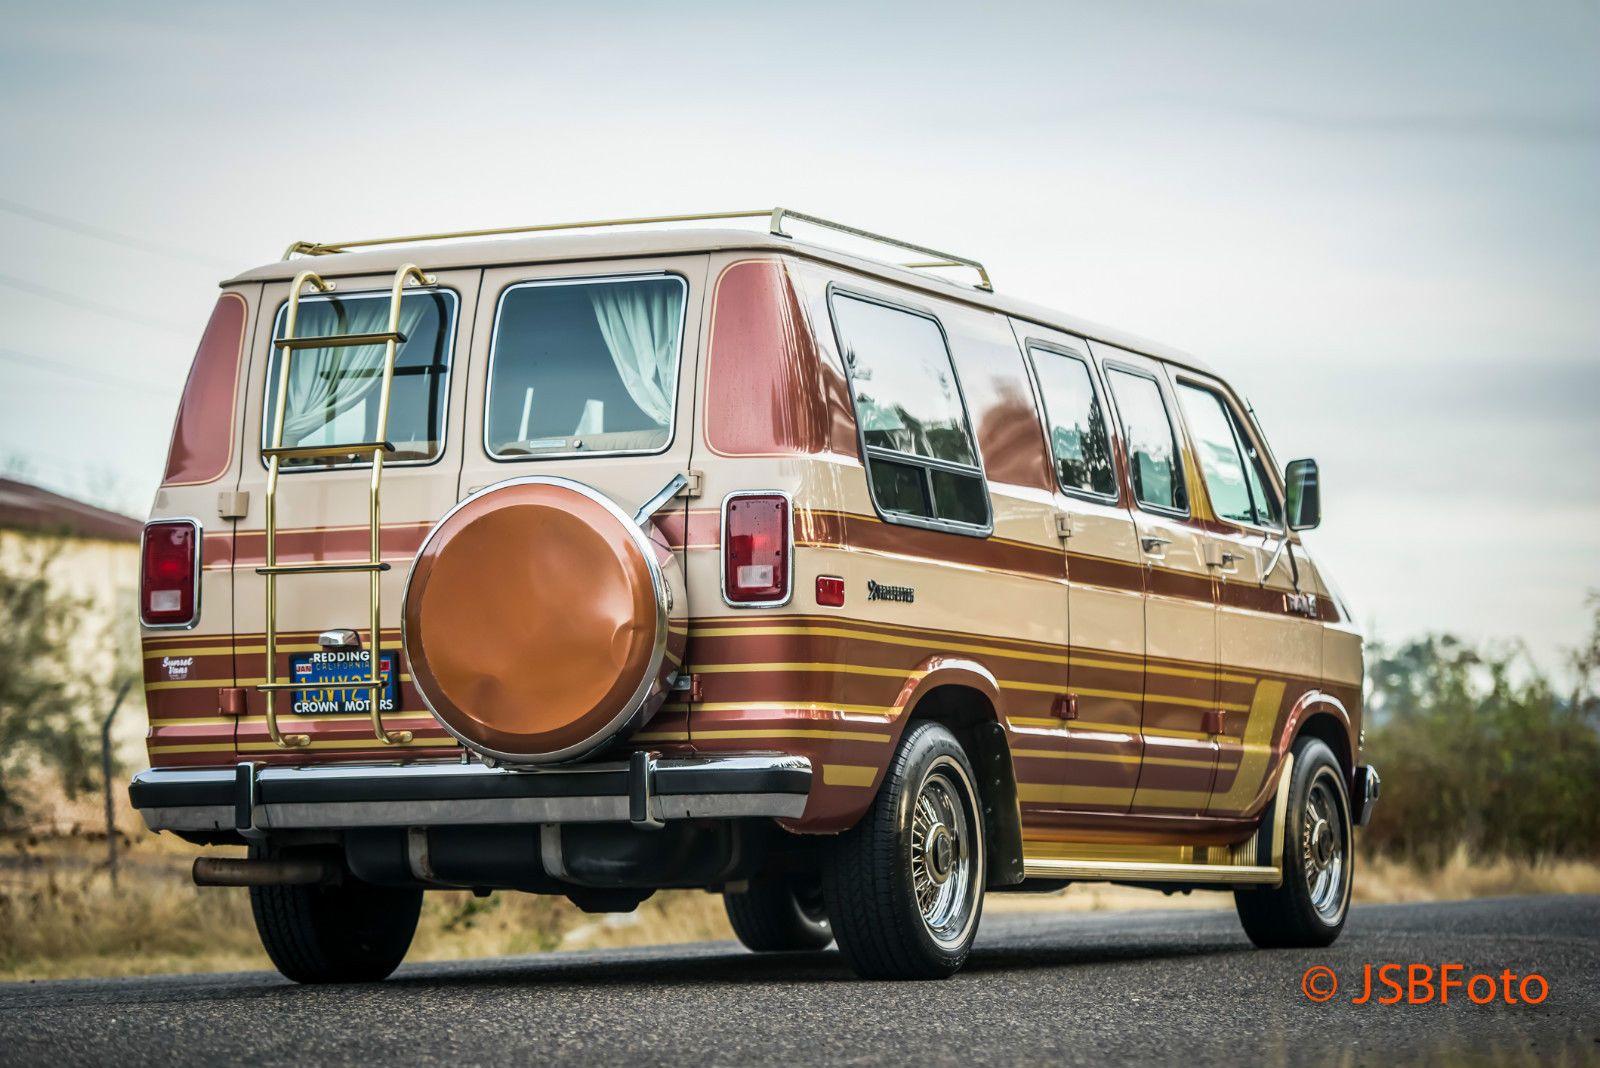 84 Dodge Prospector B250 Conversion Van